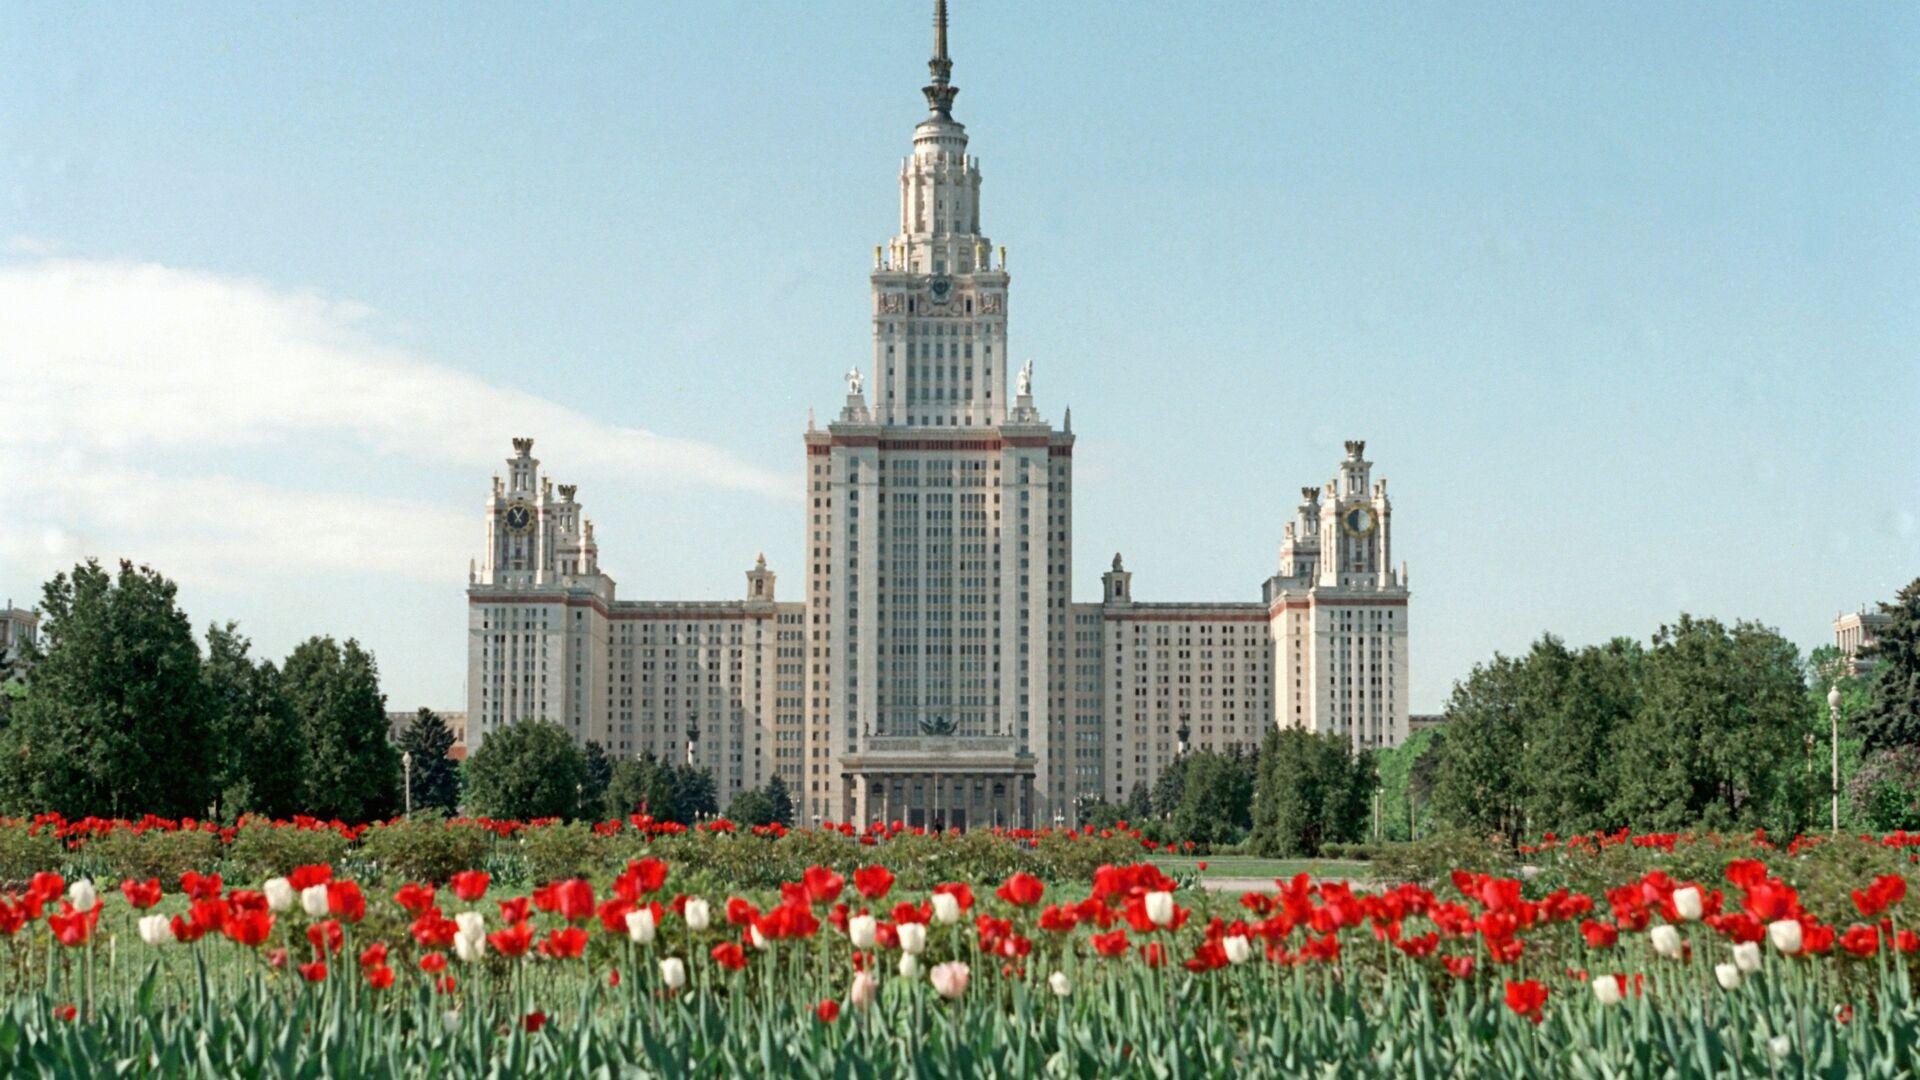 Moskovski državni univerzitet Lomonosov - Sputnik Srbija, 1920, 03.09.2021